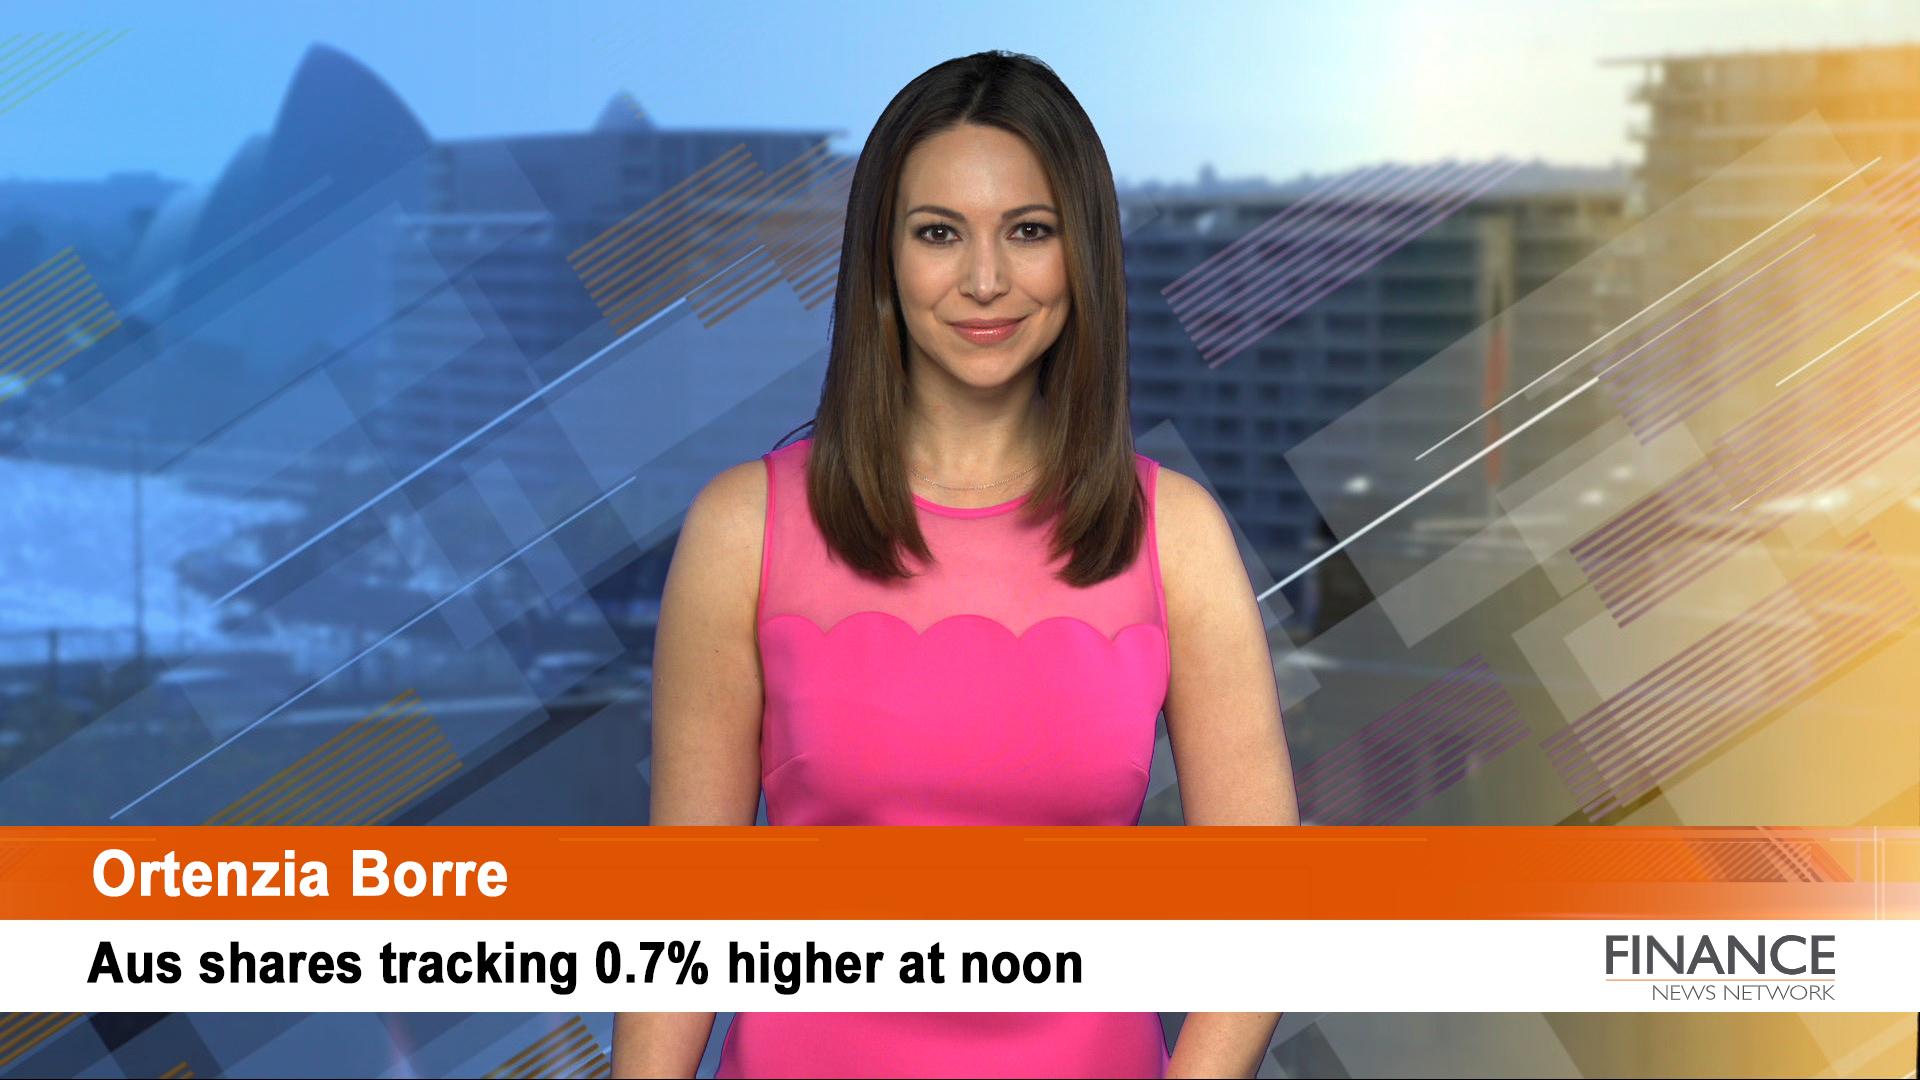 Wisr (ASX:WZR) responds to ASX: Aus shares 0.7% higher at noon